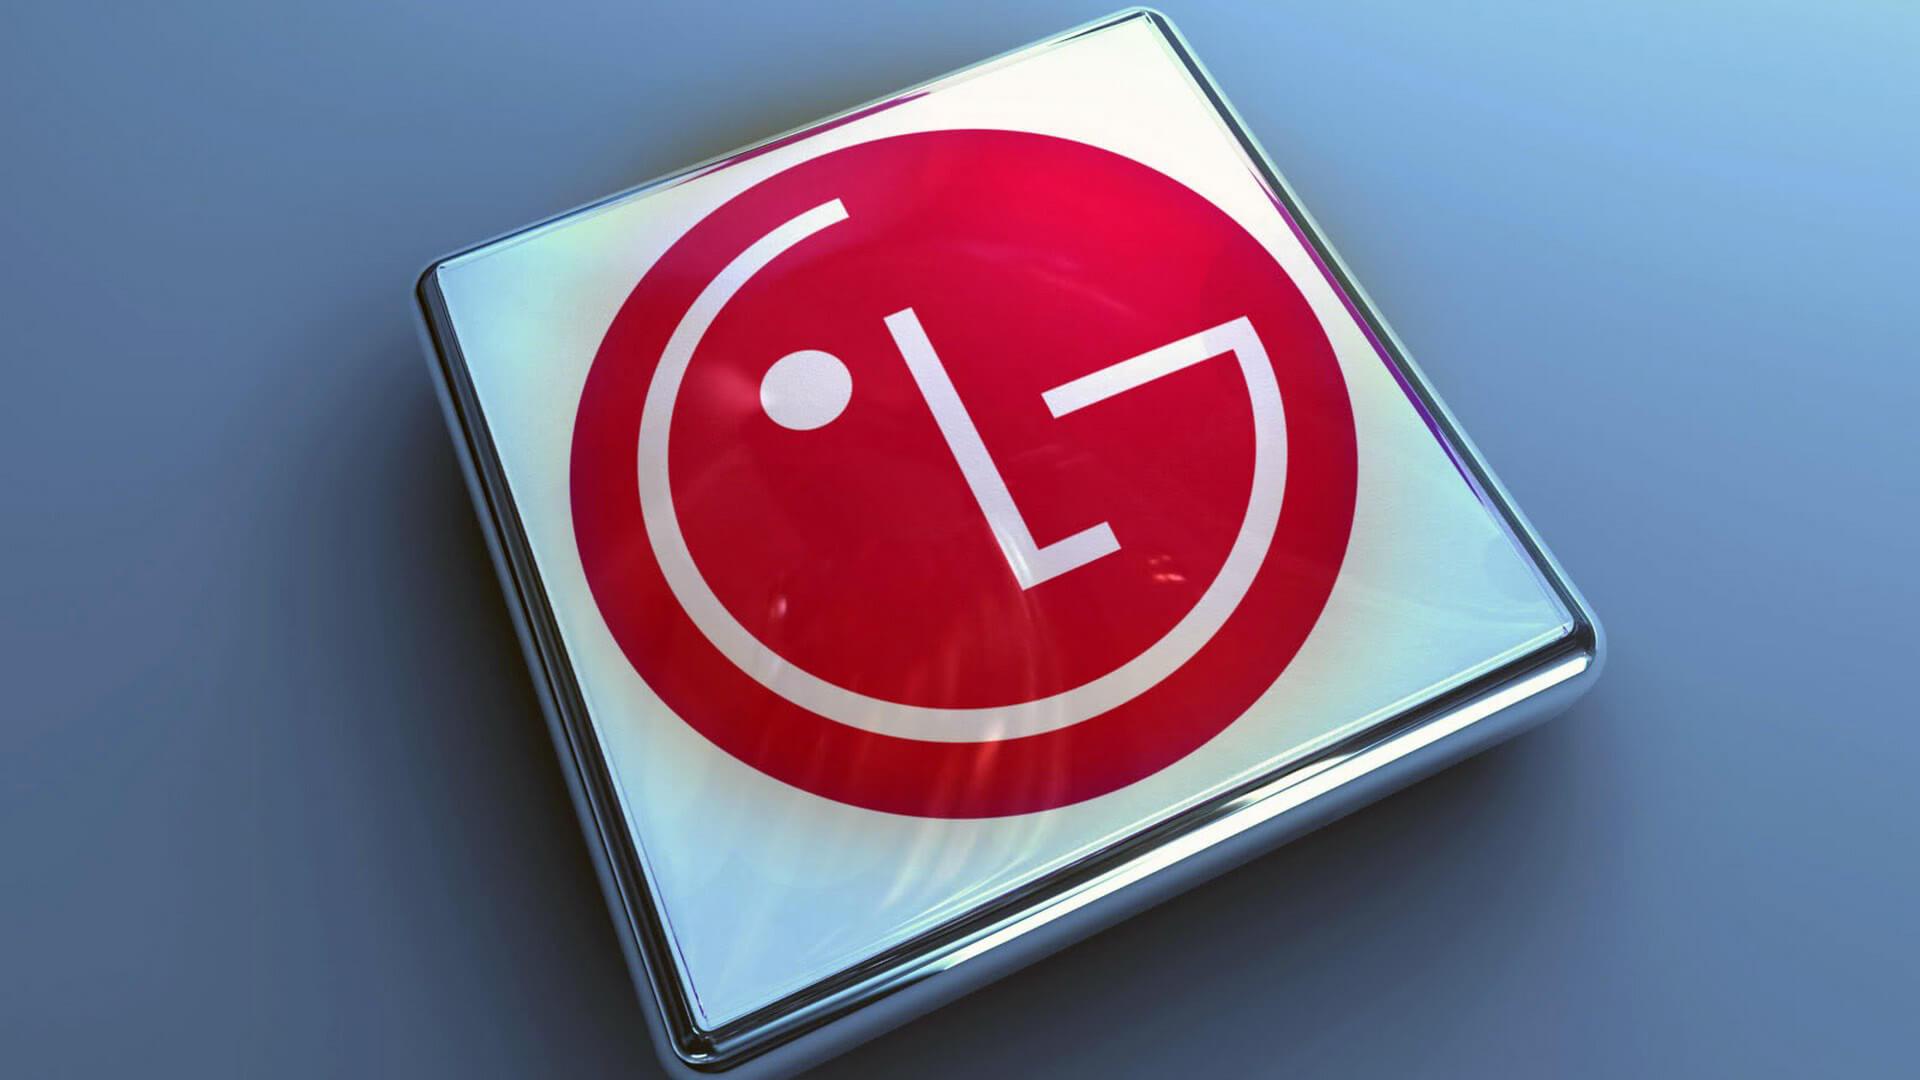 Lg Logos Phone - #GolfClub